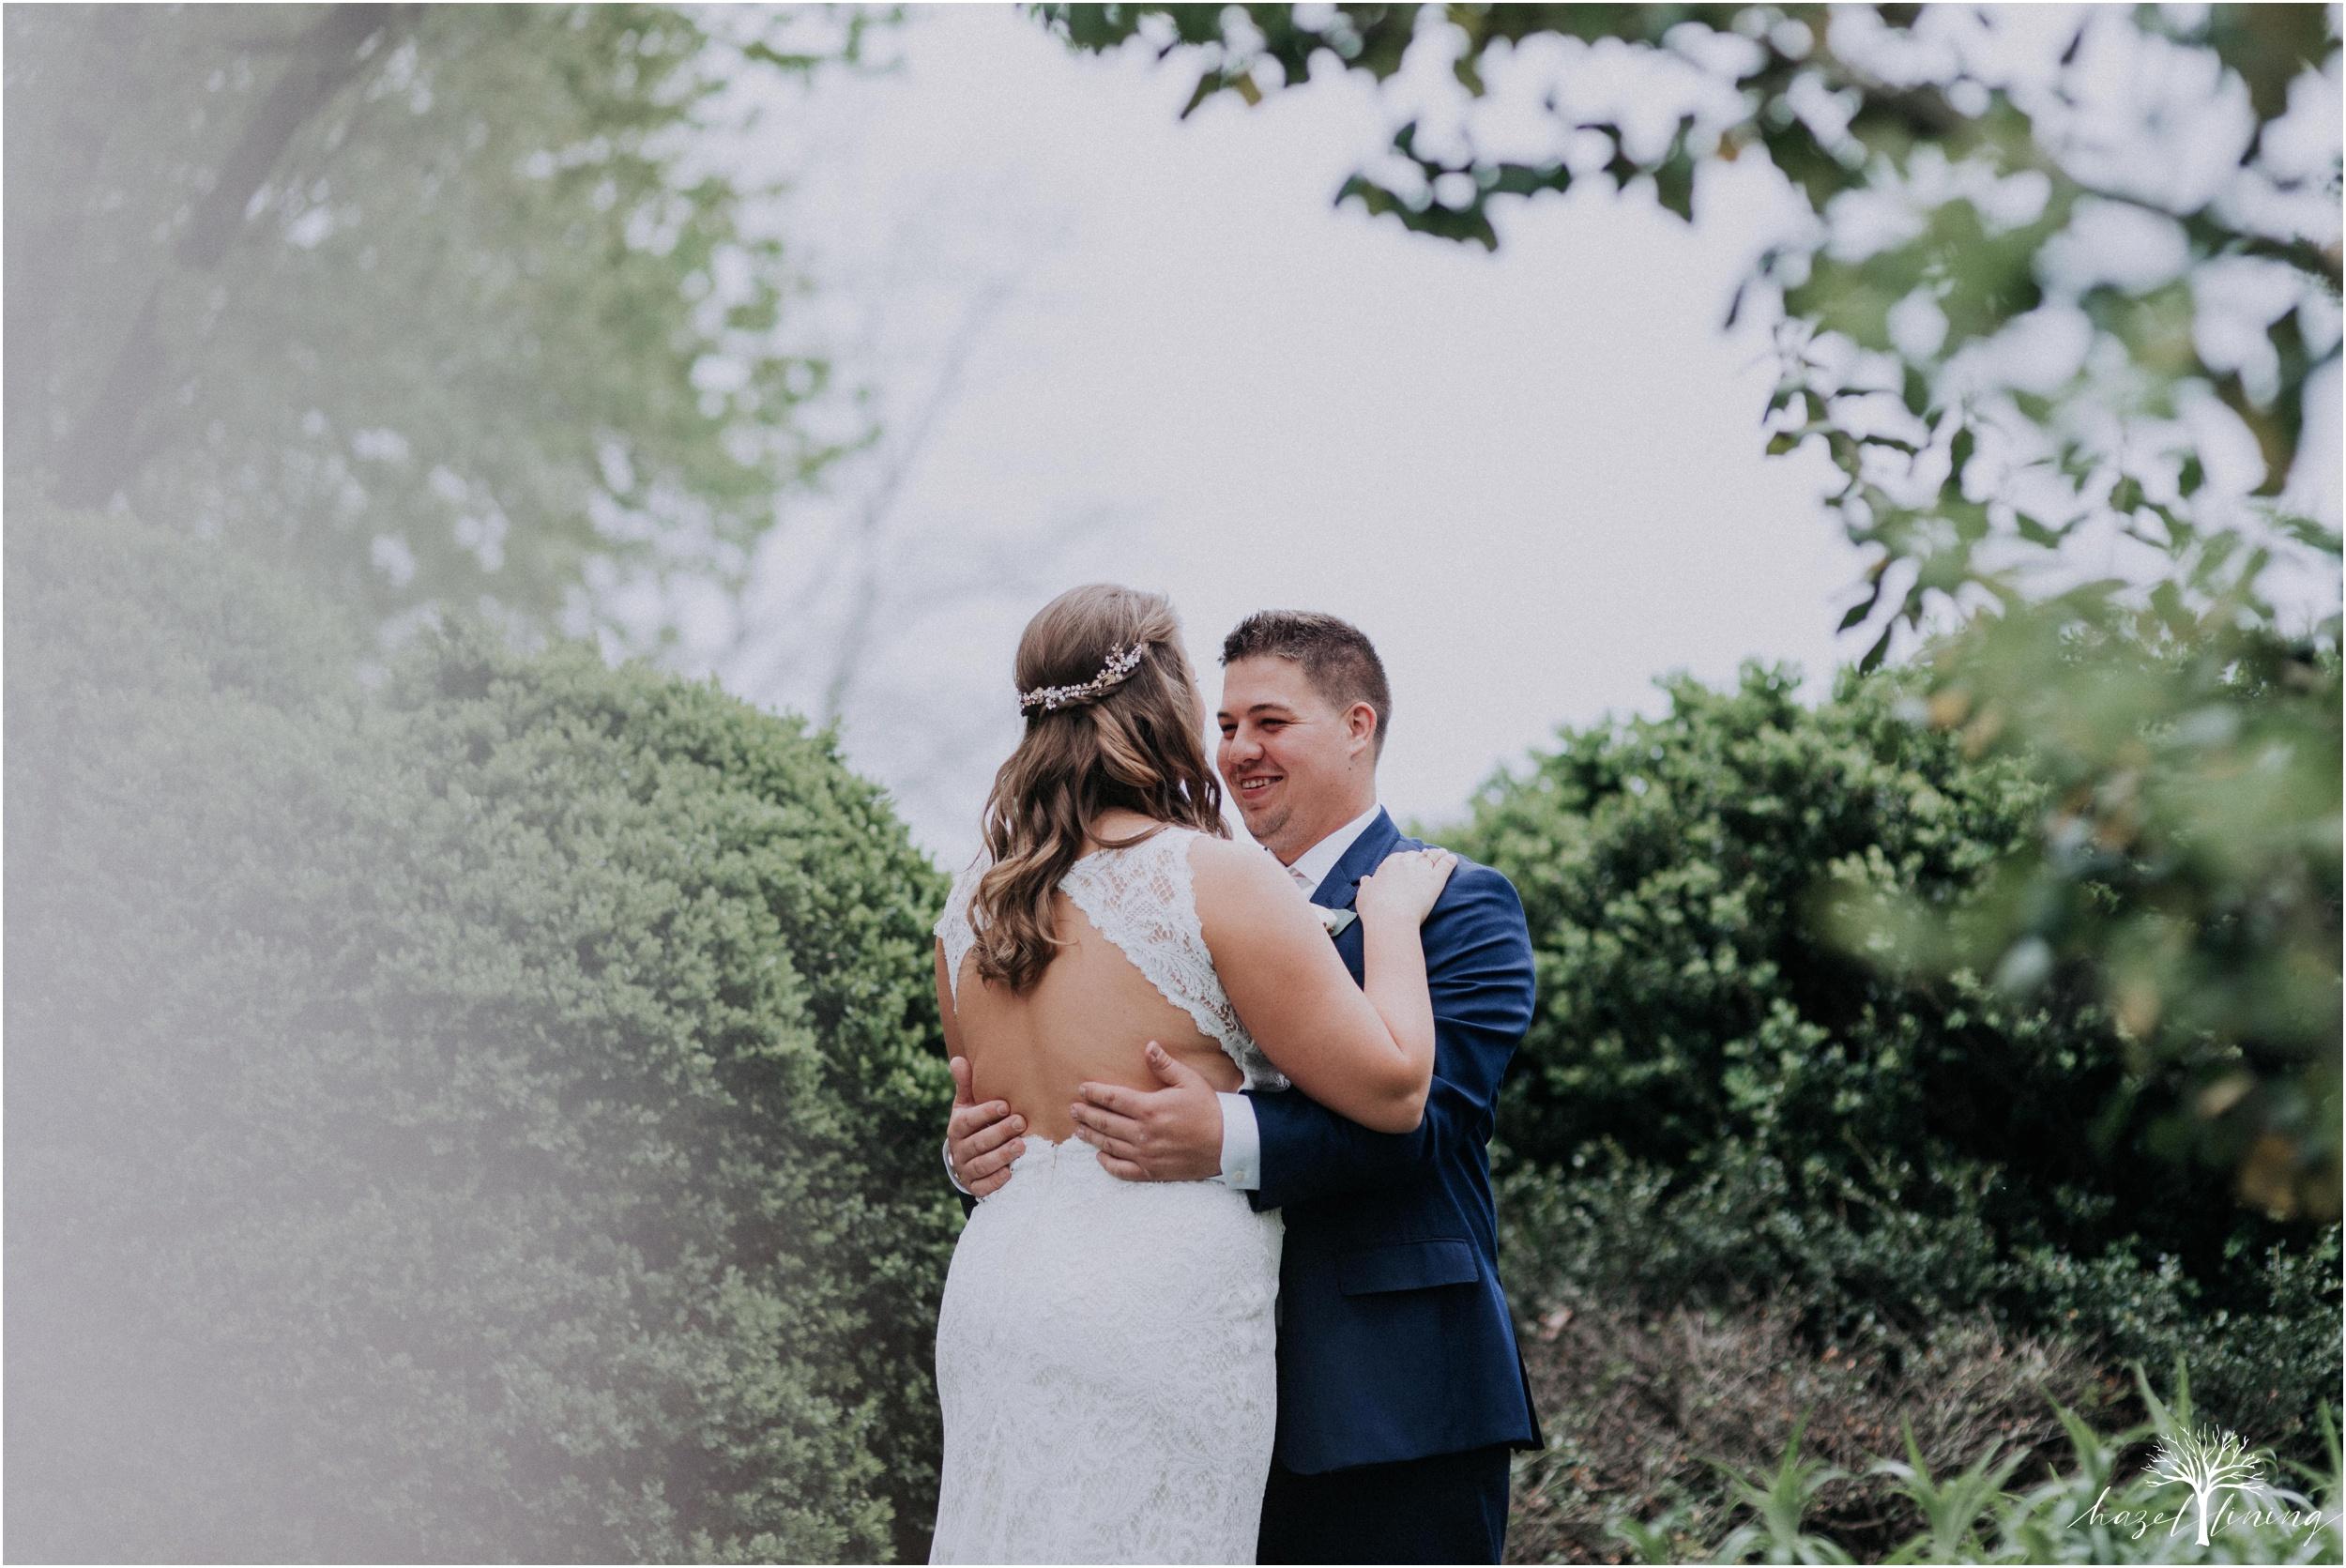 hazel-lining-travel-wedding-elopement-photography-abby-skyler-hunt-the-willis-house-york-pennsylvania-outdoor-estate-wedding_0035.jpg